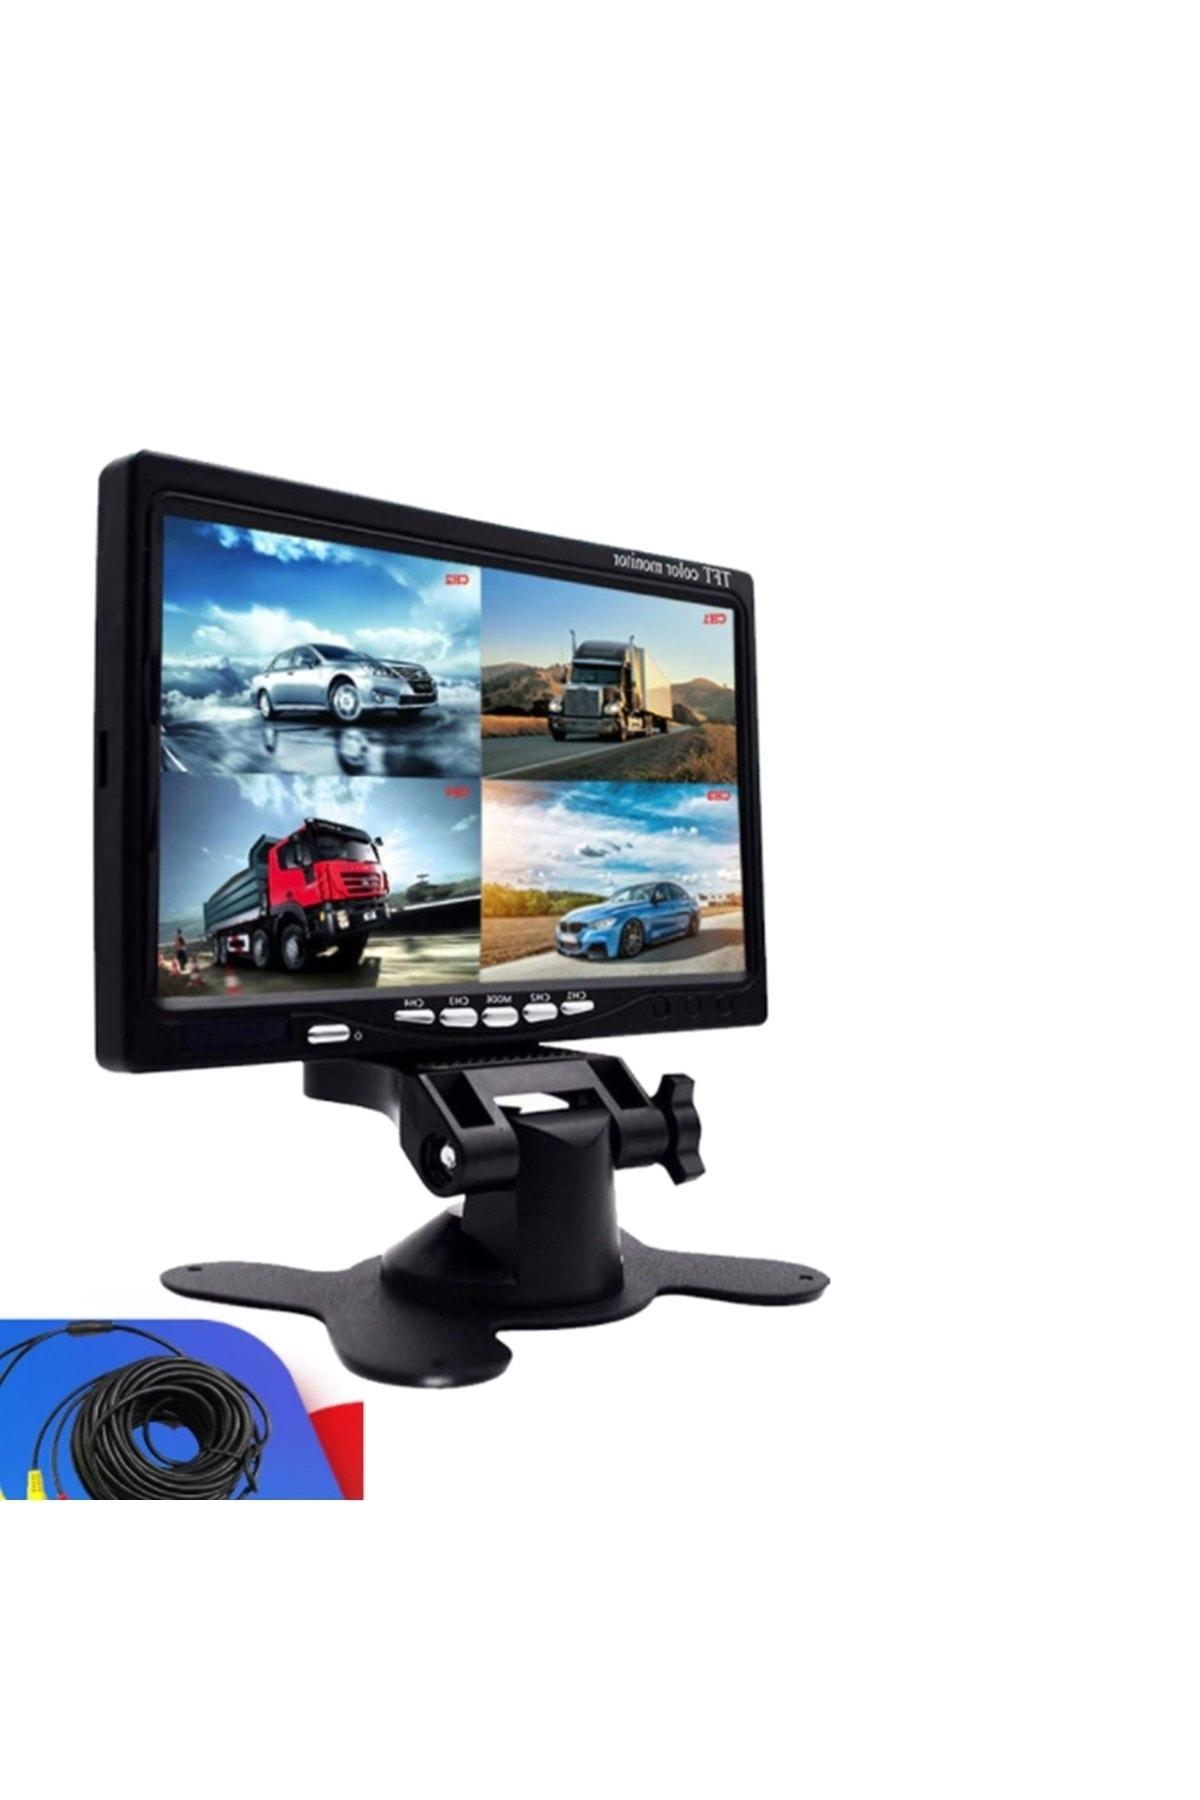 "AEM Servis Tip Lcd Ekran 4 Bölge Gösteren Kamera 7"" 1"